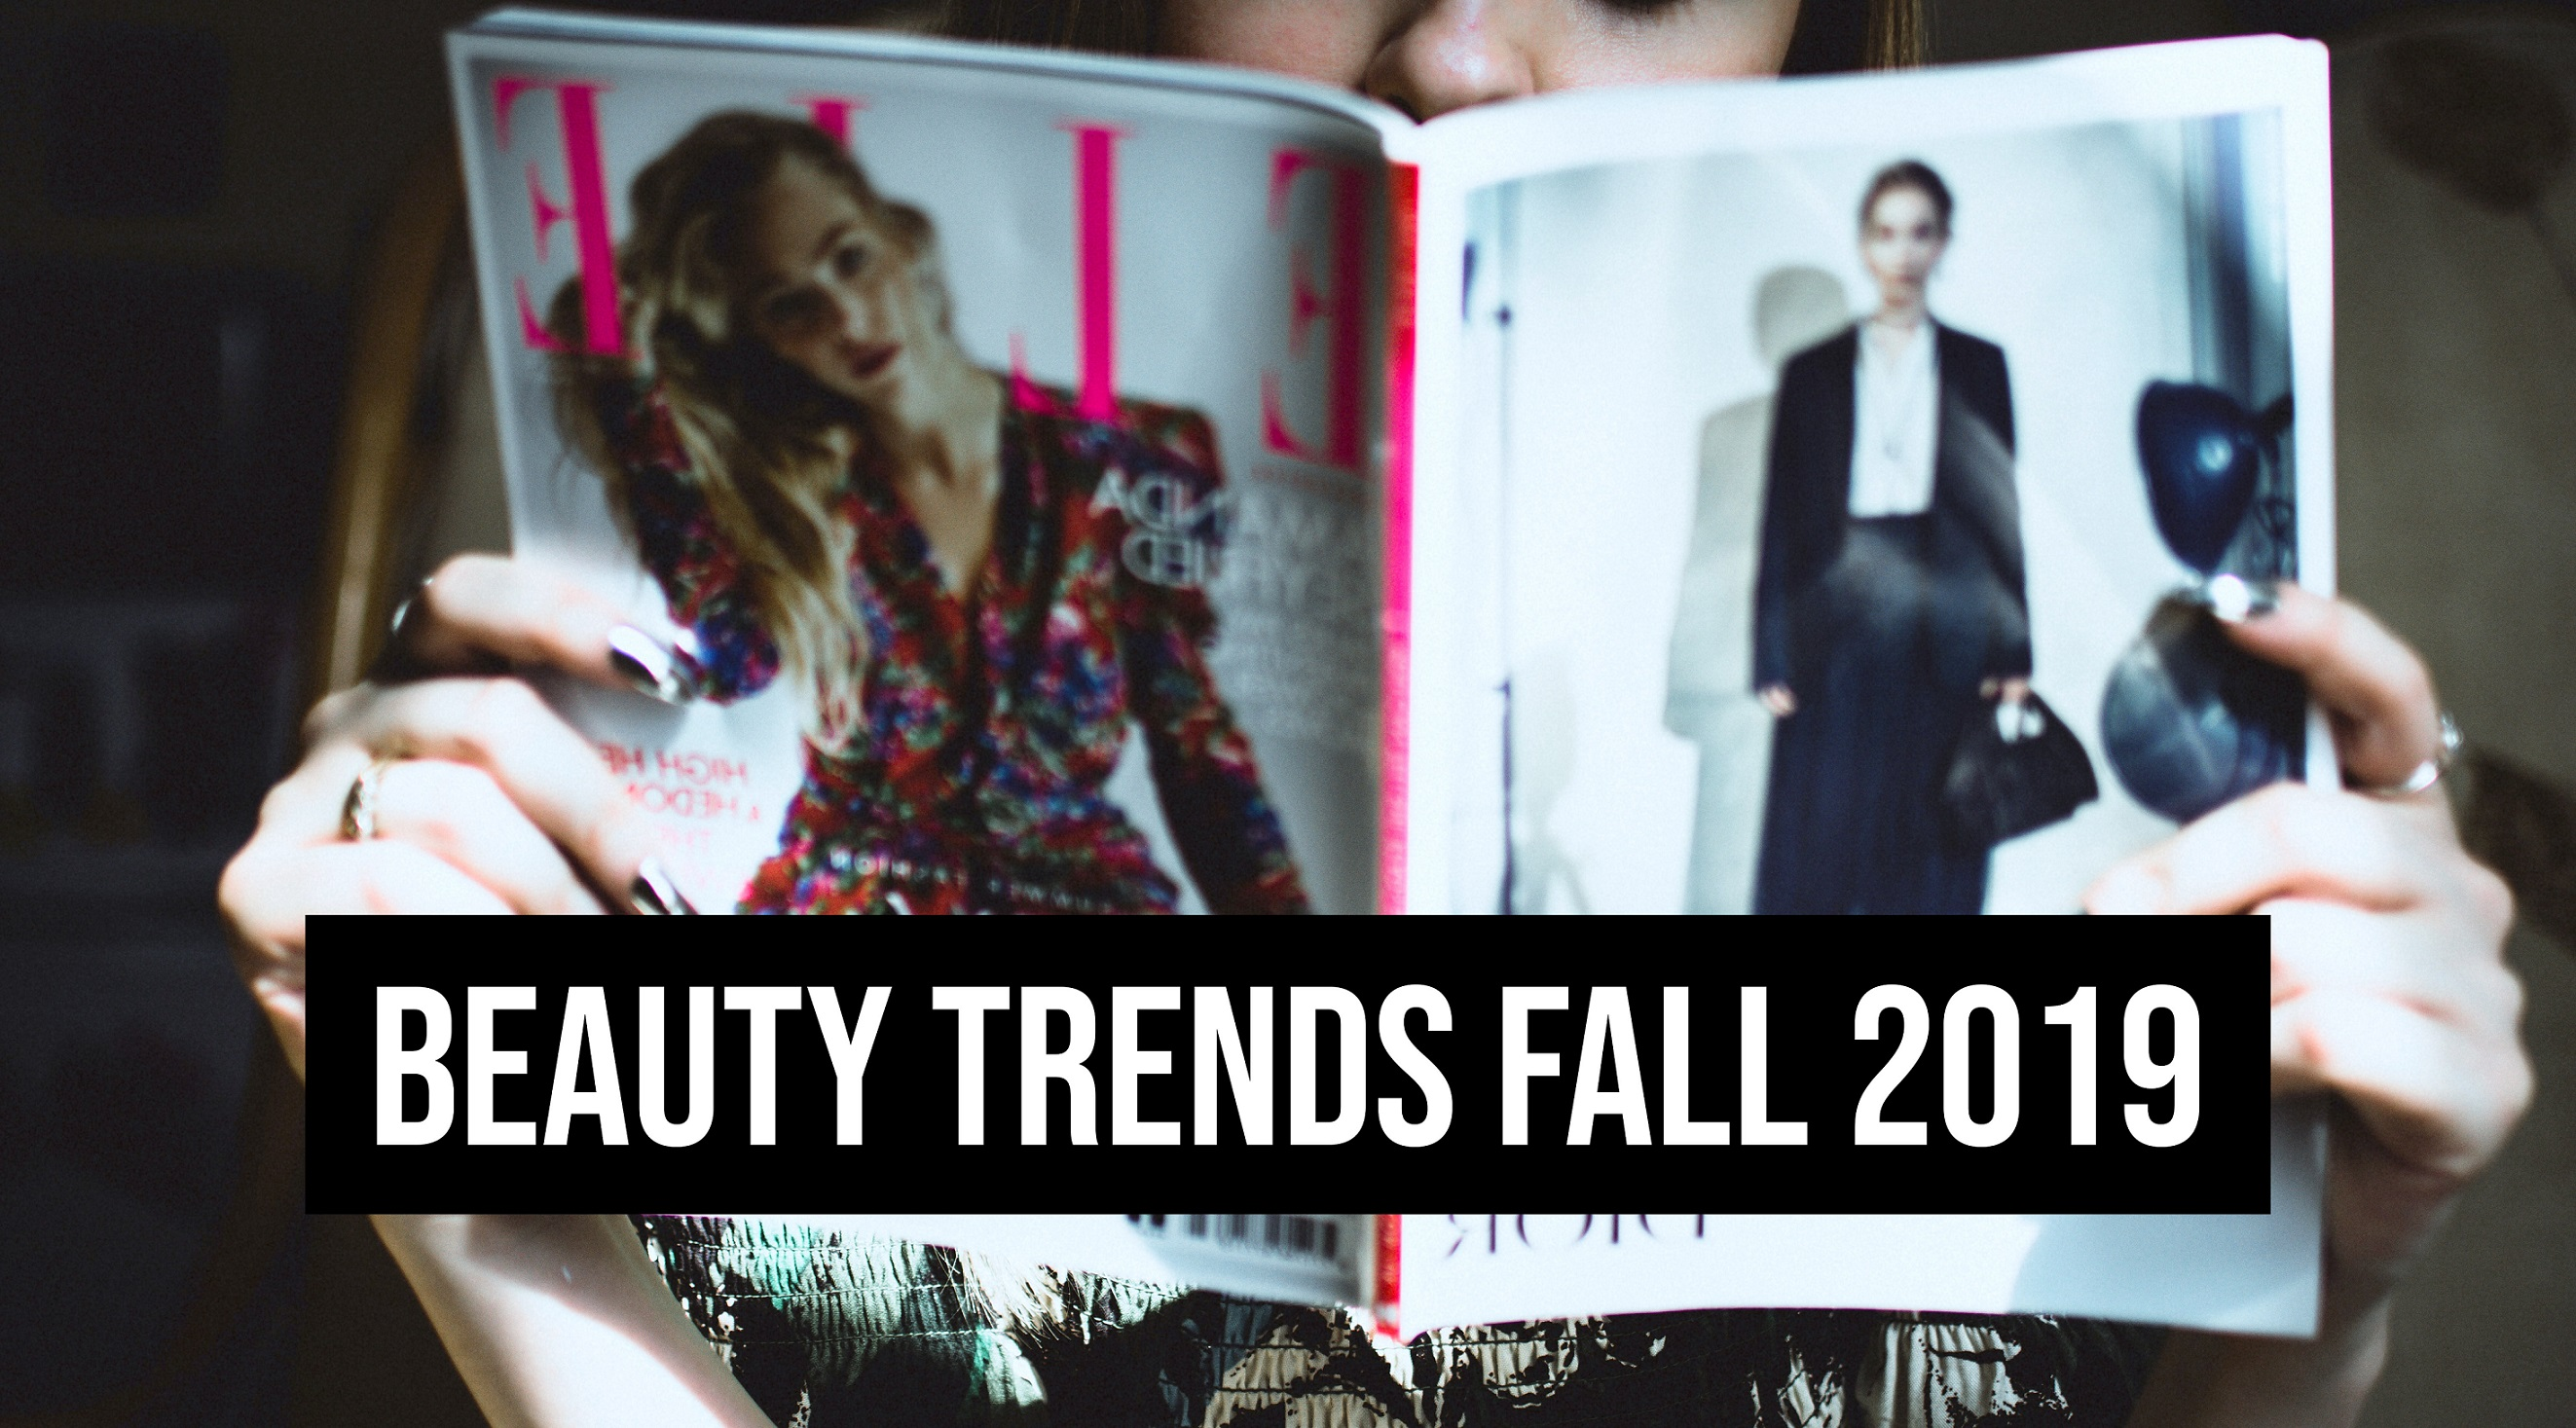 Beauty Trends Fall 2019